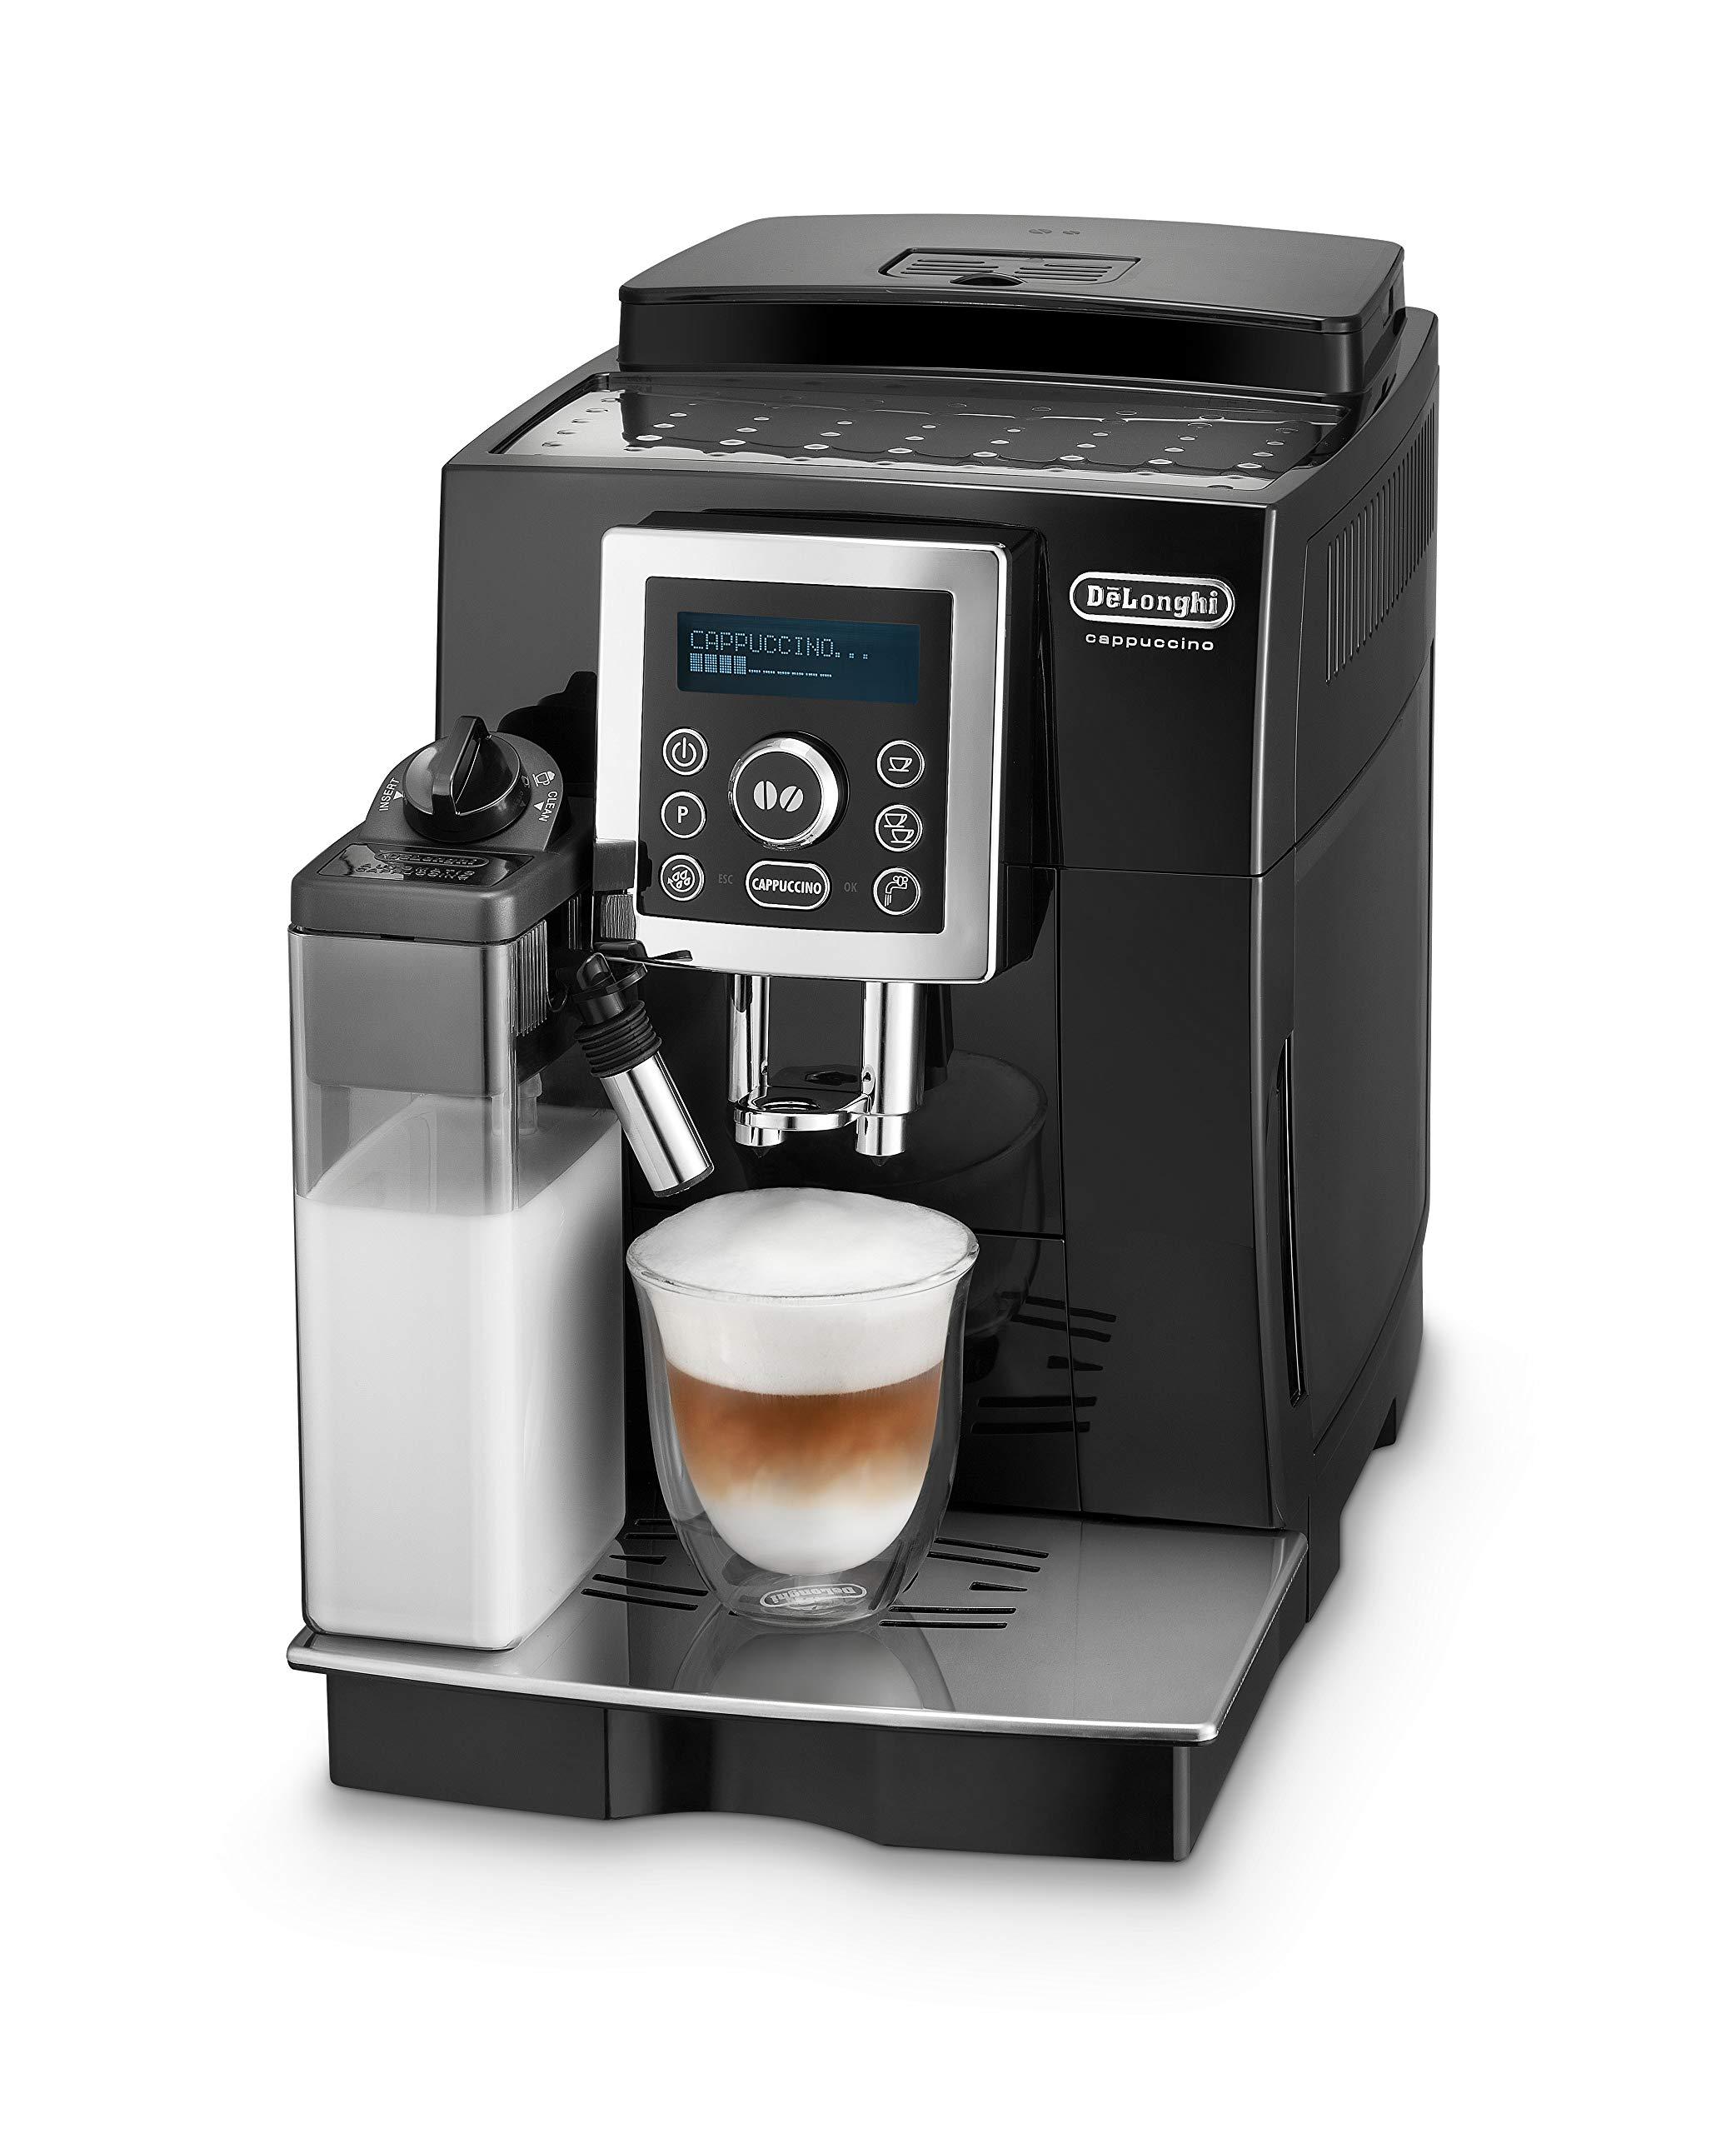 De'Longhi ECAM 23.466.B Kaffeevollautomat, Milchsystem, Cappuccino, schwarz